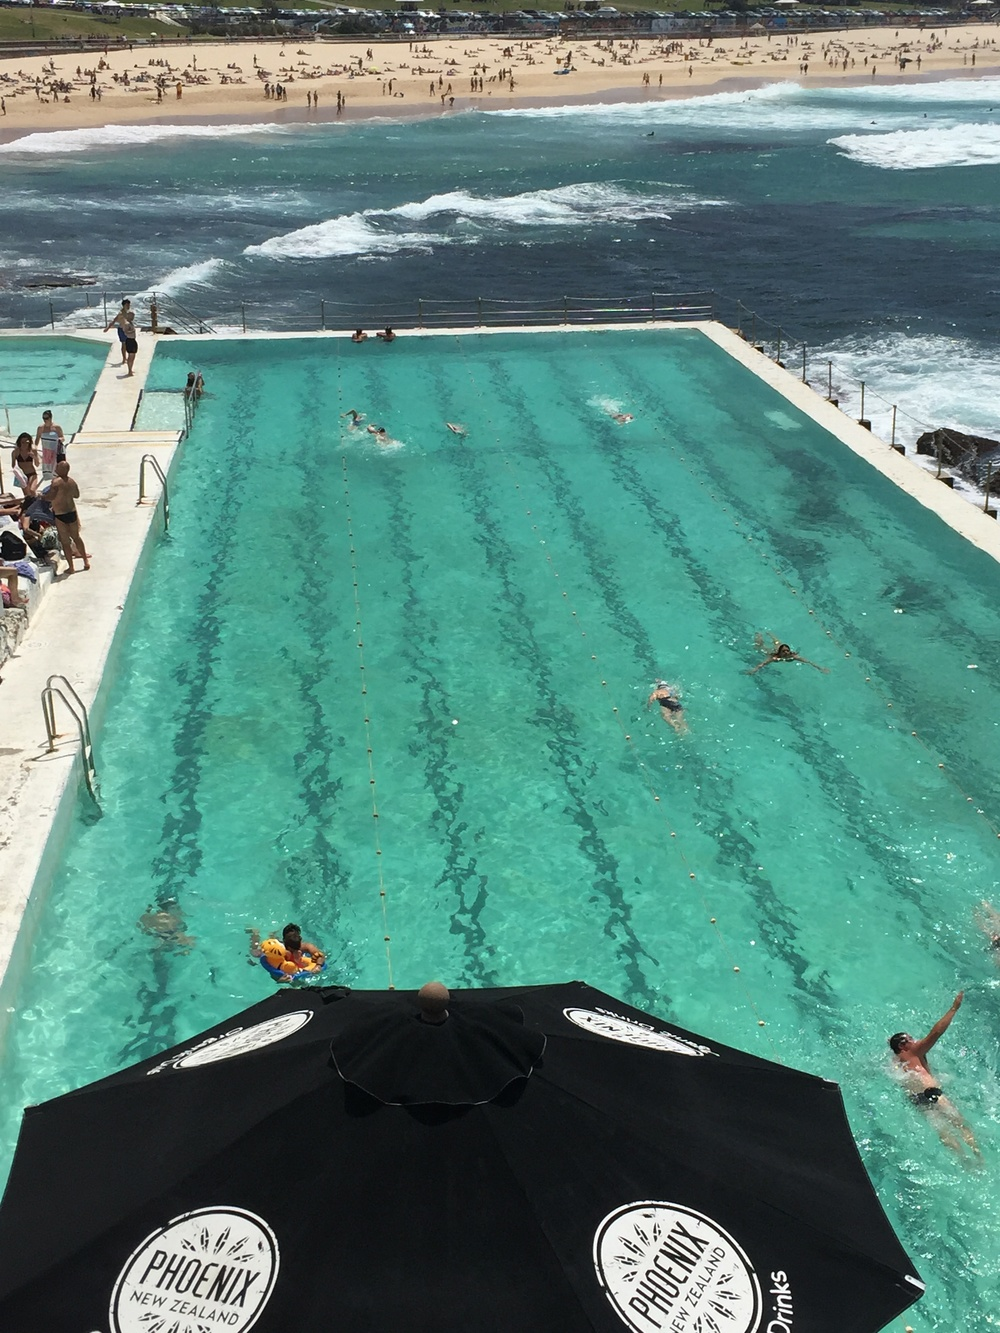 Swimming in Bondi Icebergs pool before going to work